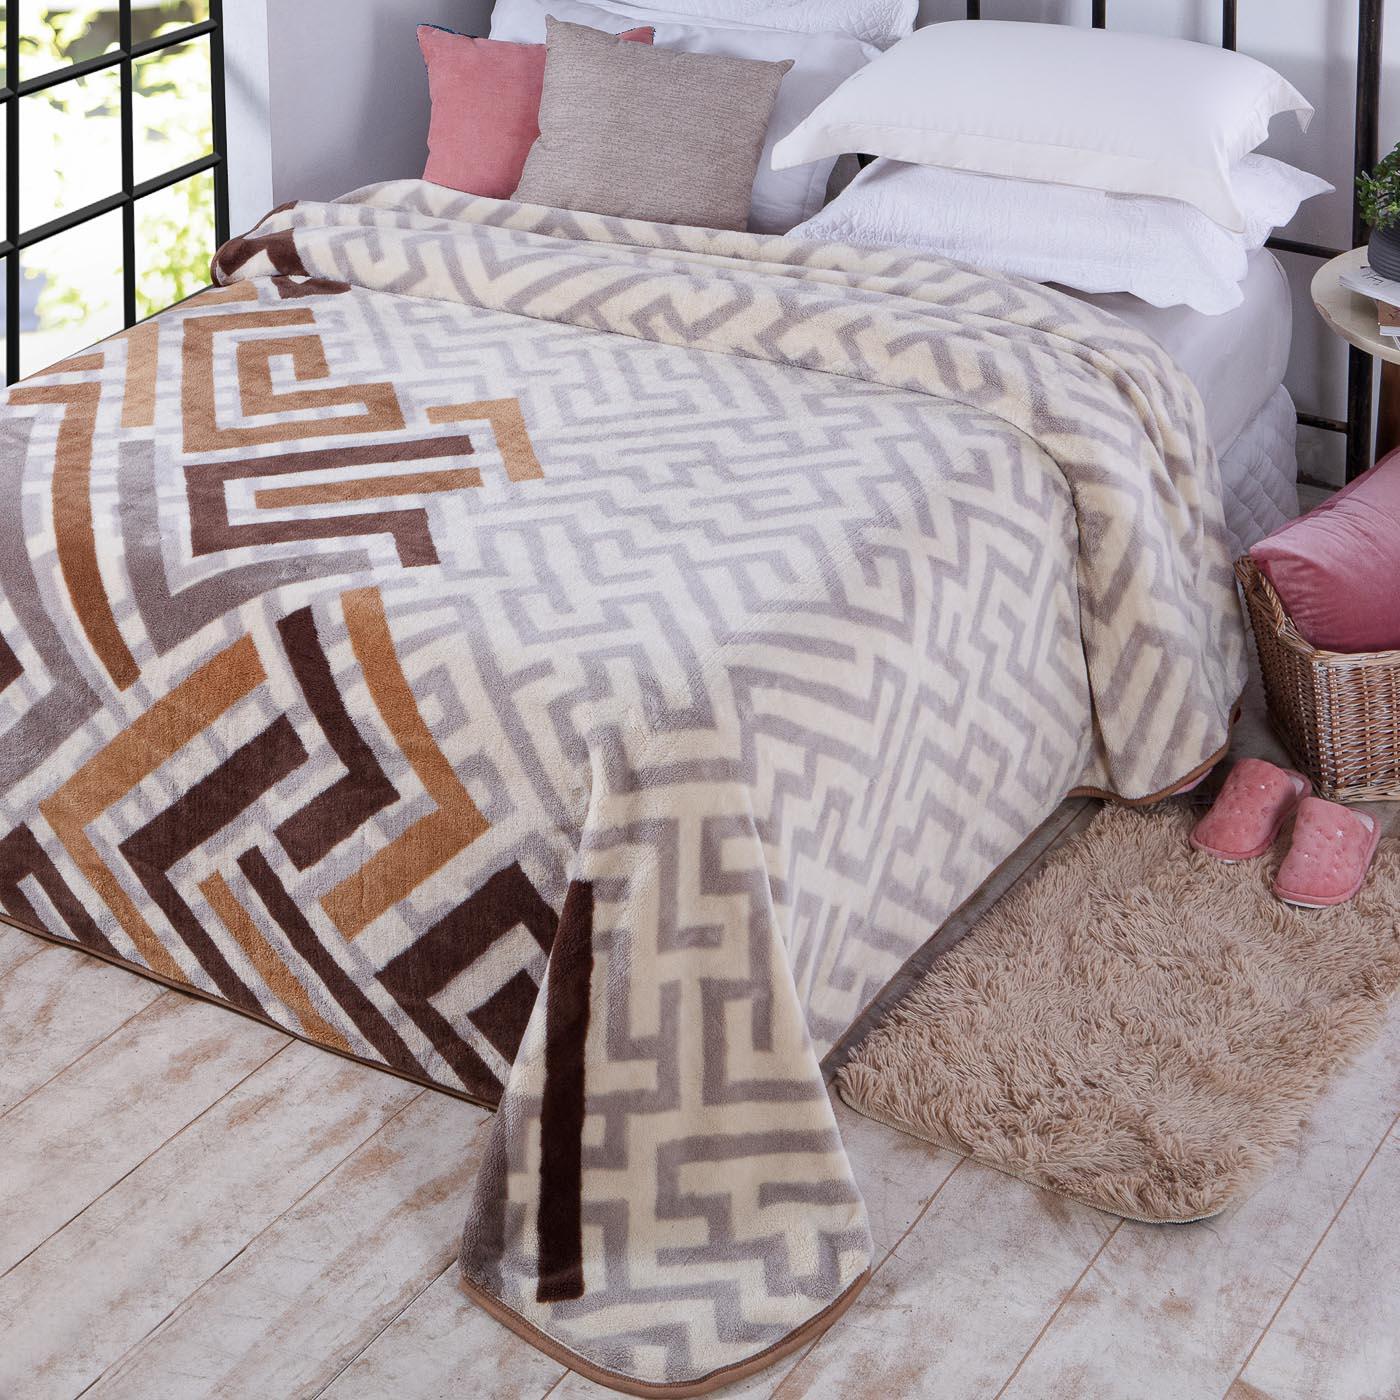 Cobertor Casal Kyor Plus Jolitex Ternille 1,80mx2,20m Zurique Bege